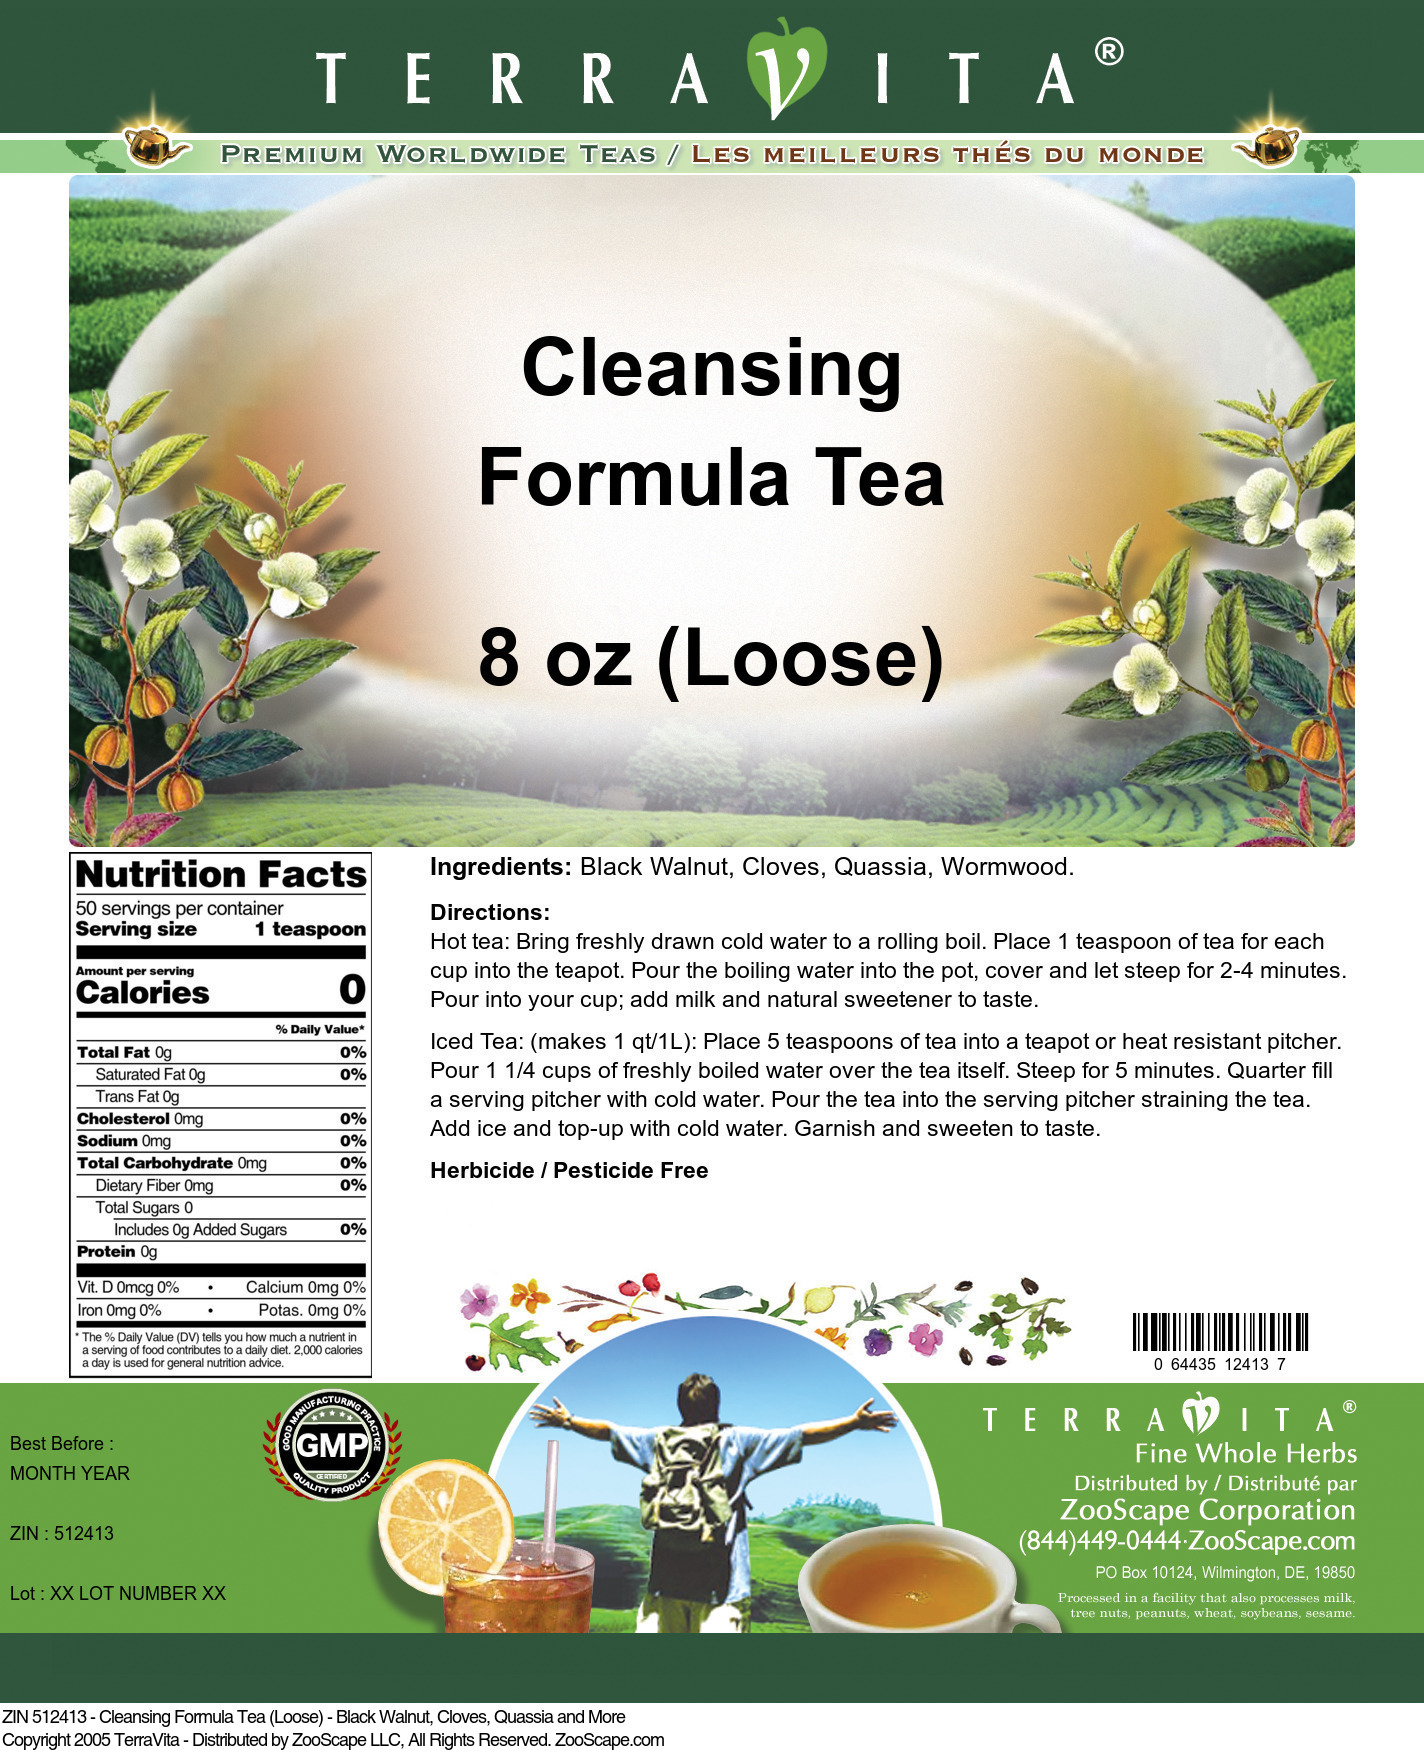 Cleansing Formula